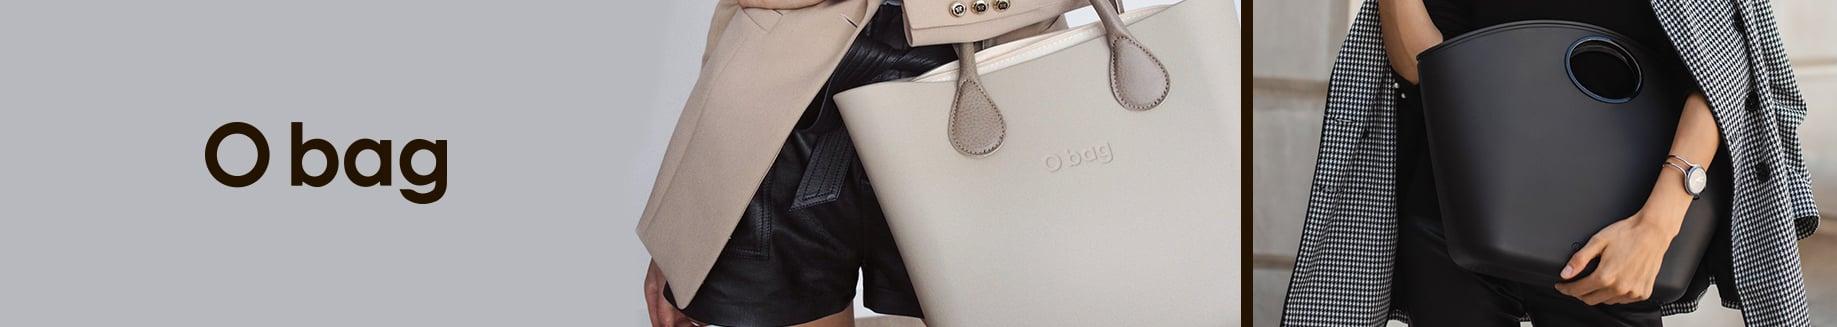 Аксессуары O bag